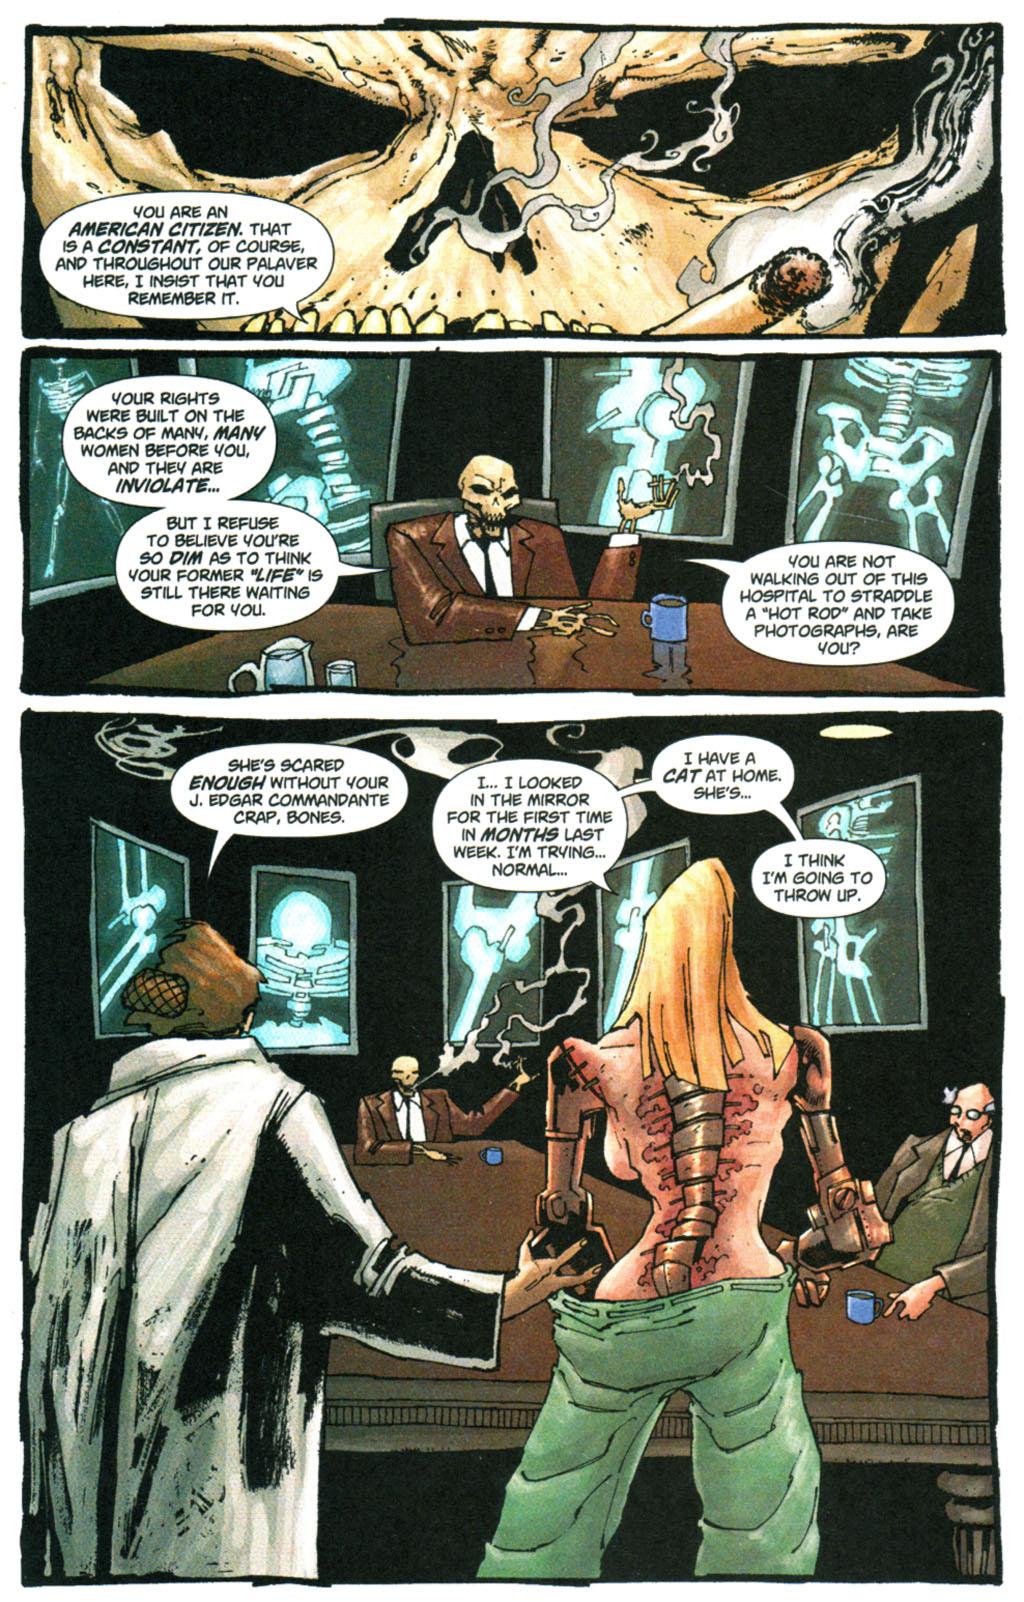 Read online Enginehead comic -  Issue #5 - 6